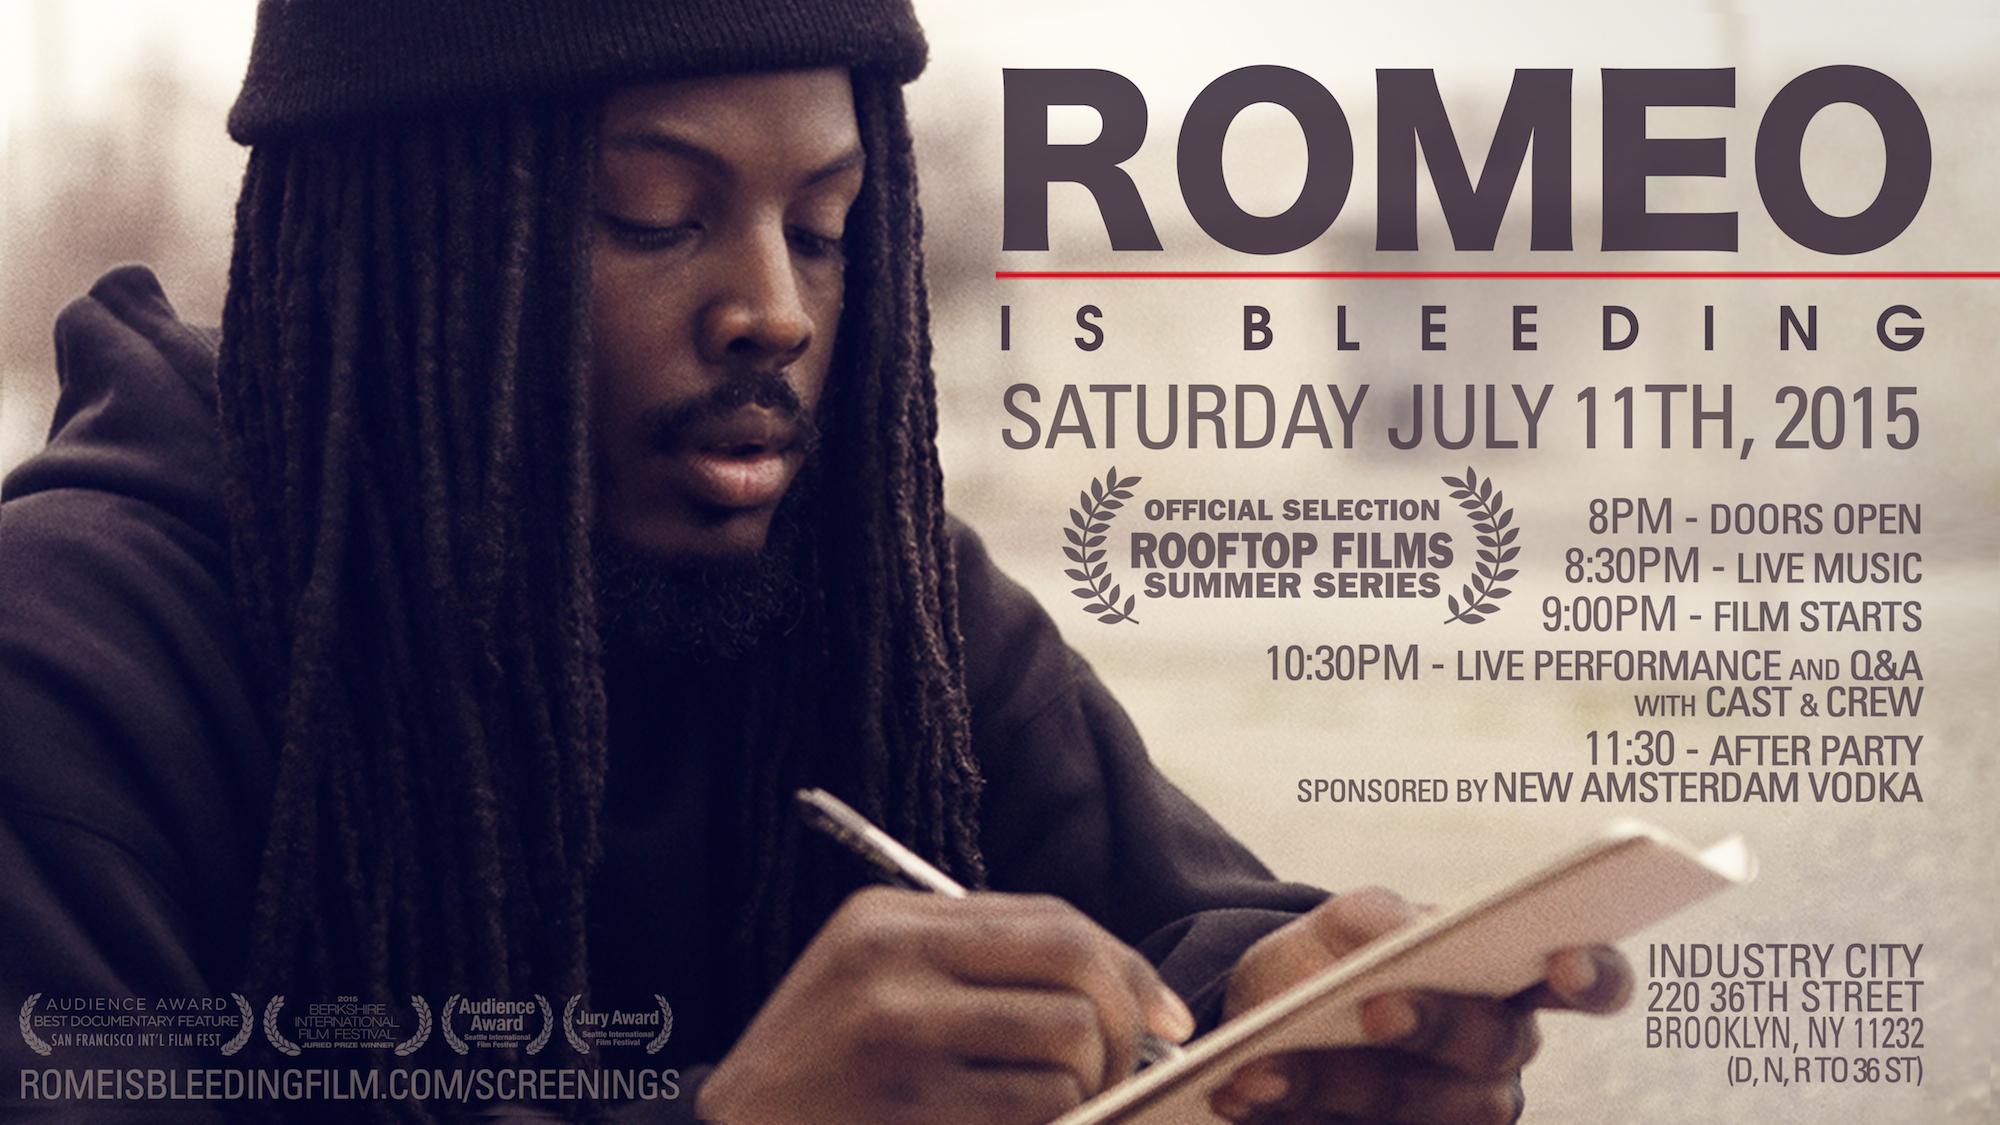 c/o romeoisbleedingfilm.com